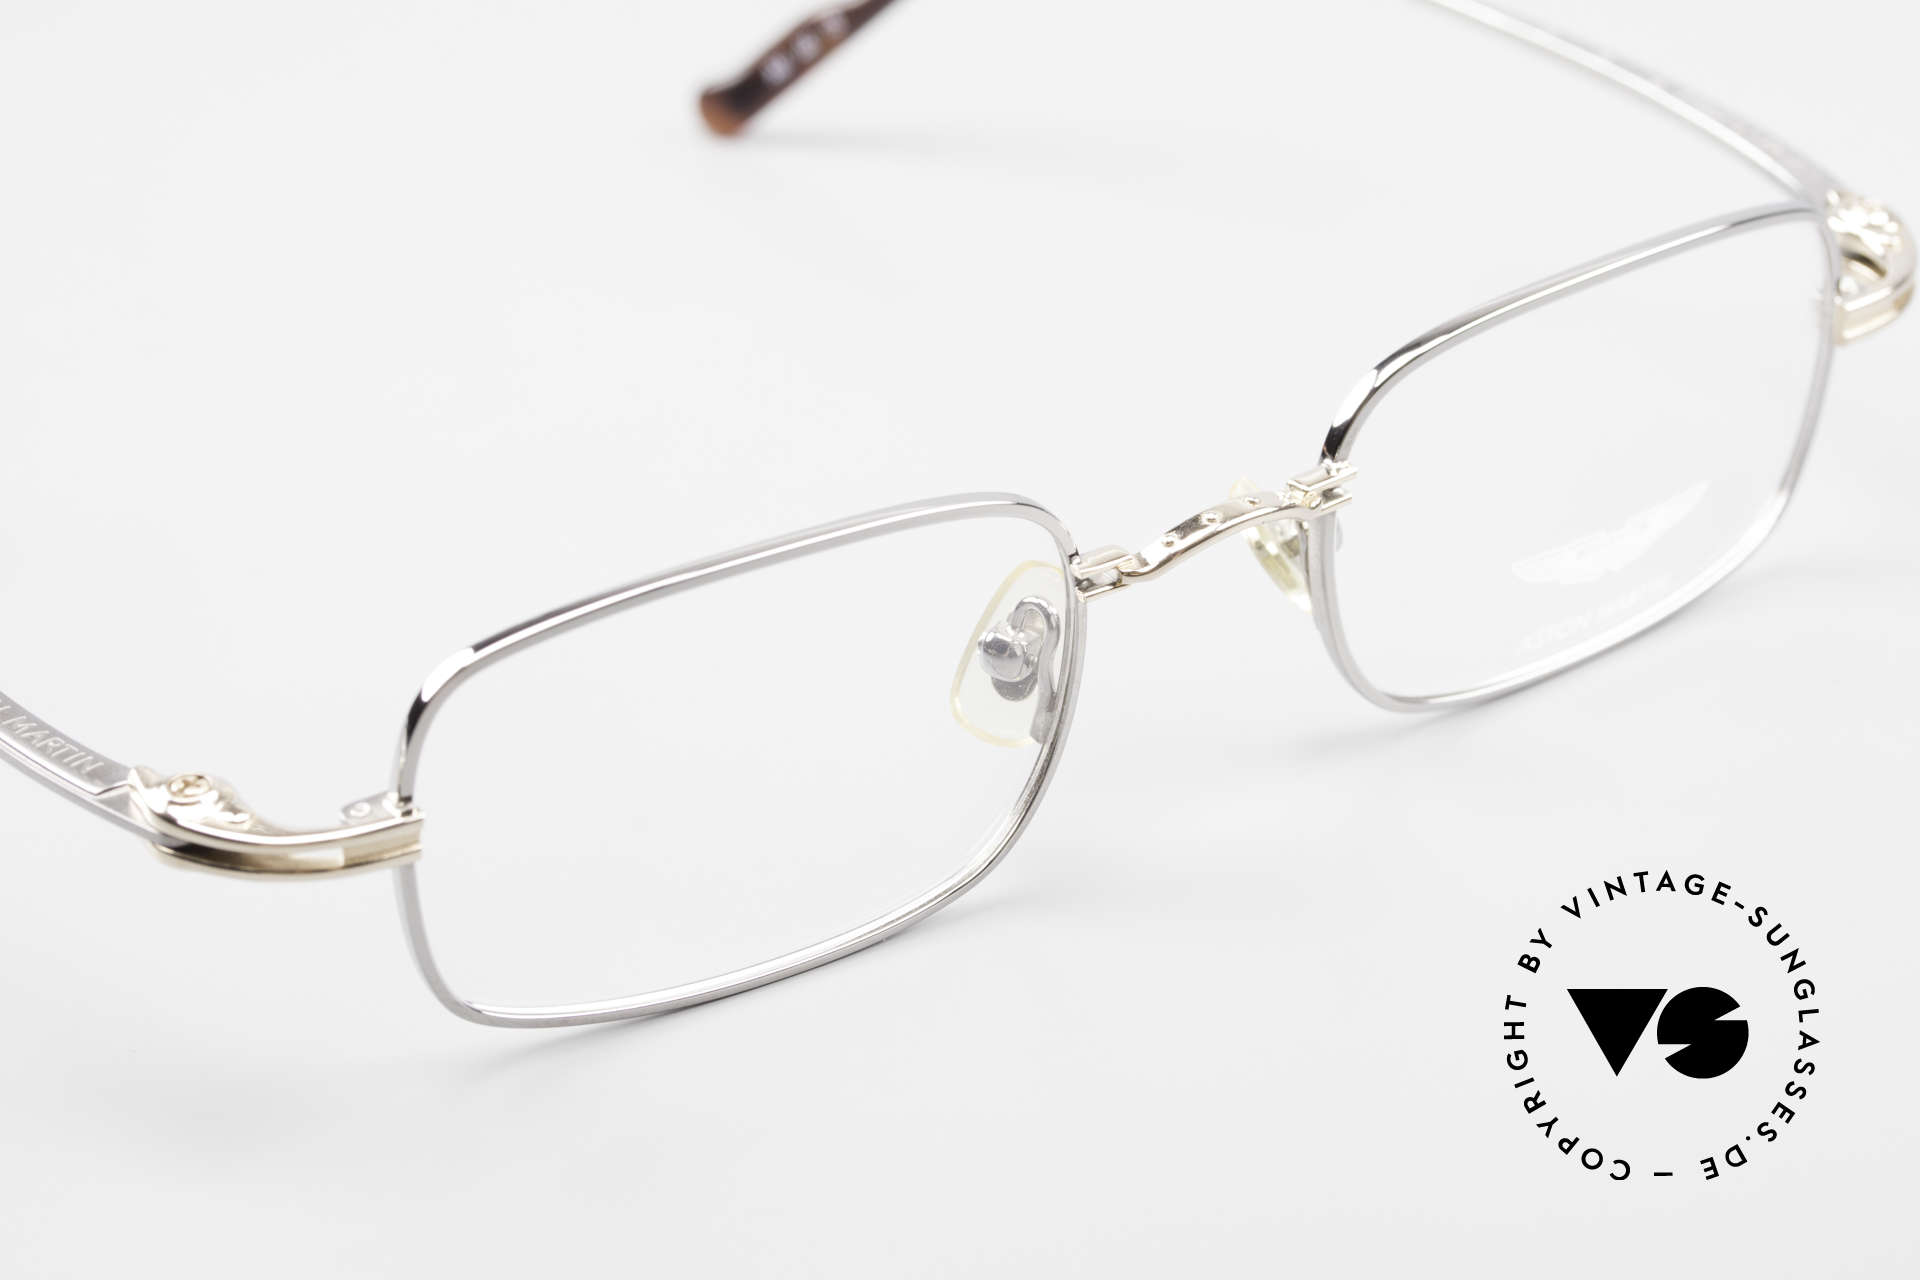 Aston Martin AM44 Square Men's Frame Titanium, NO RETRO glasses, but a real 90's original in size 49/21, Made for Men